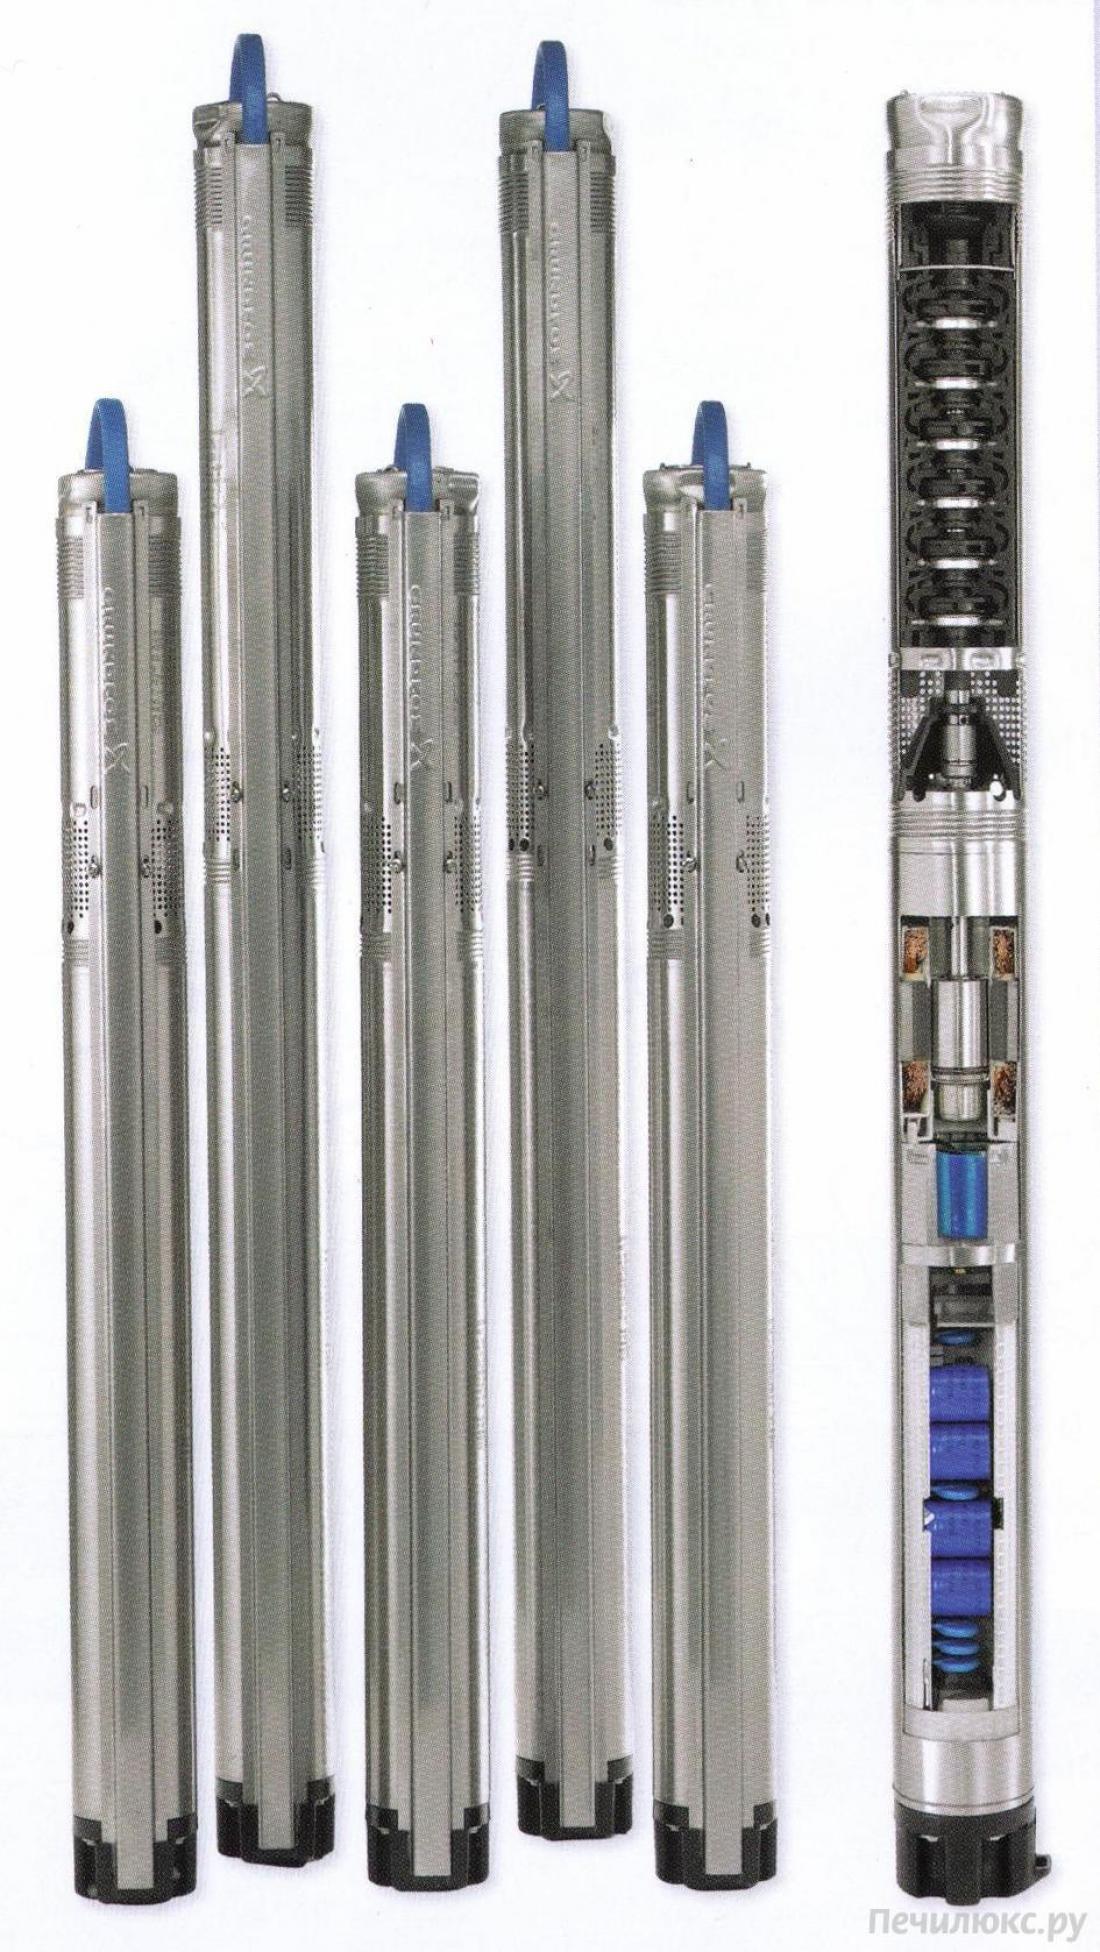 SQ  3- 65 1.15kW 200-240V 50/60Hz  40M